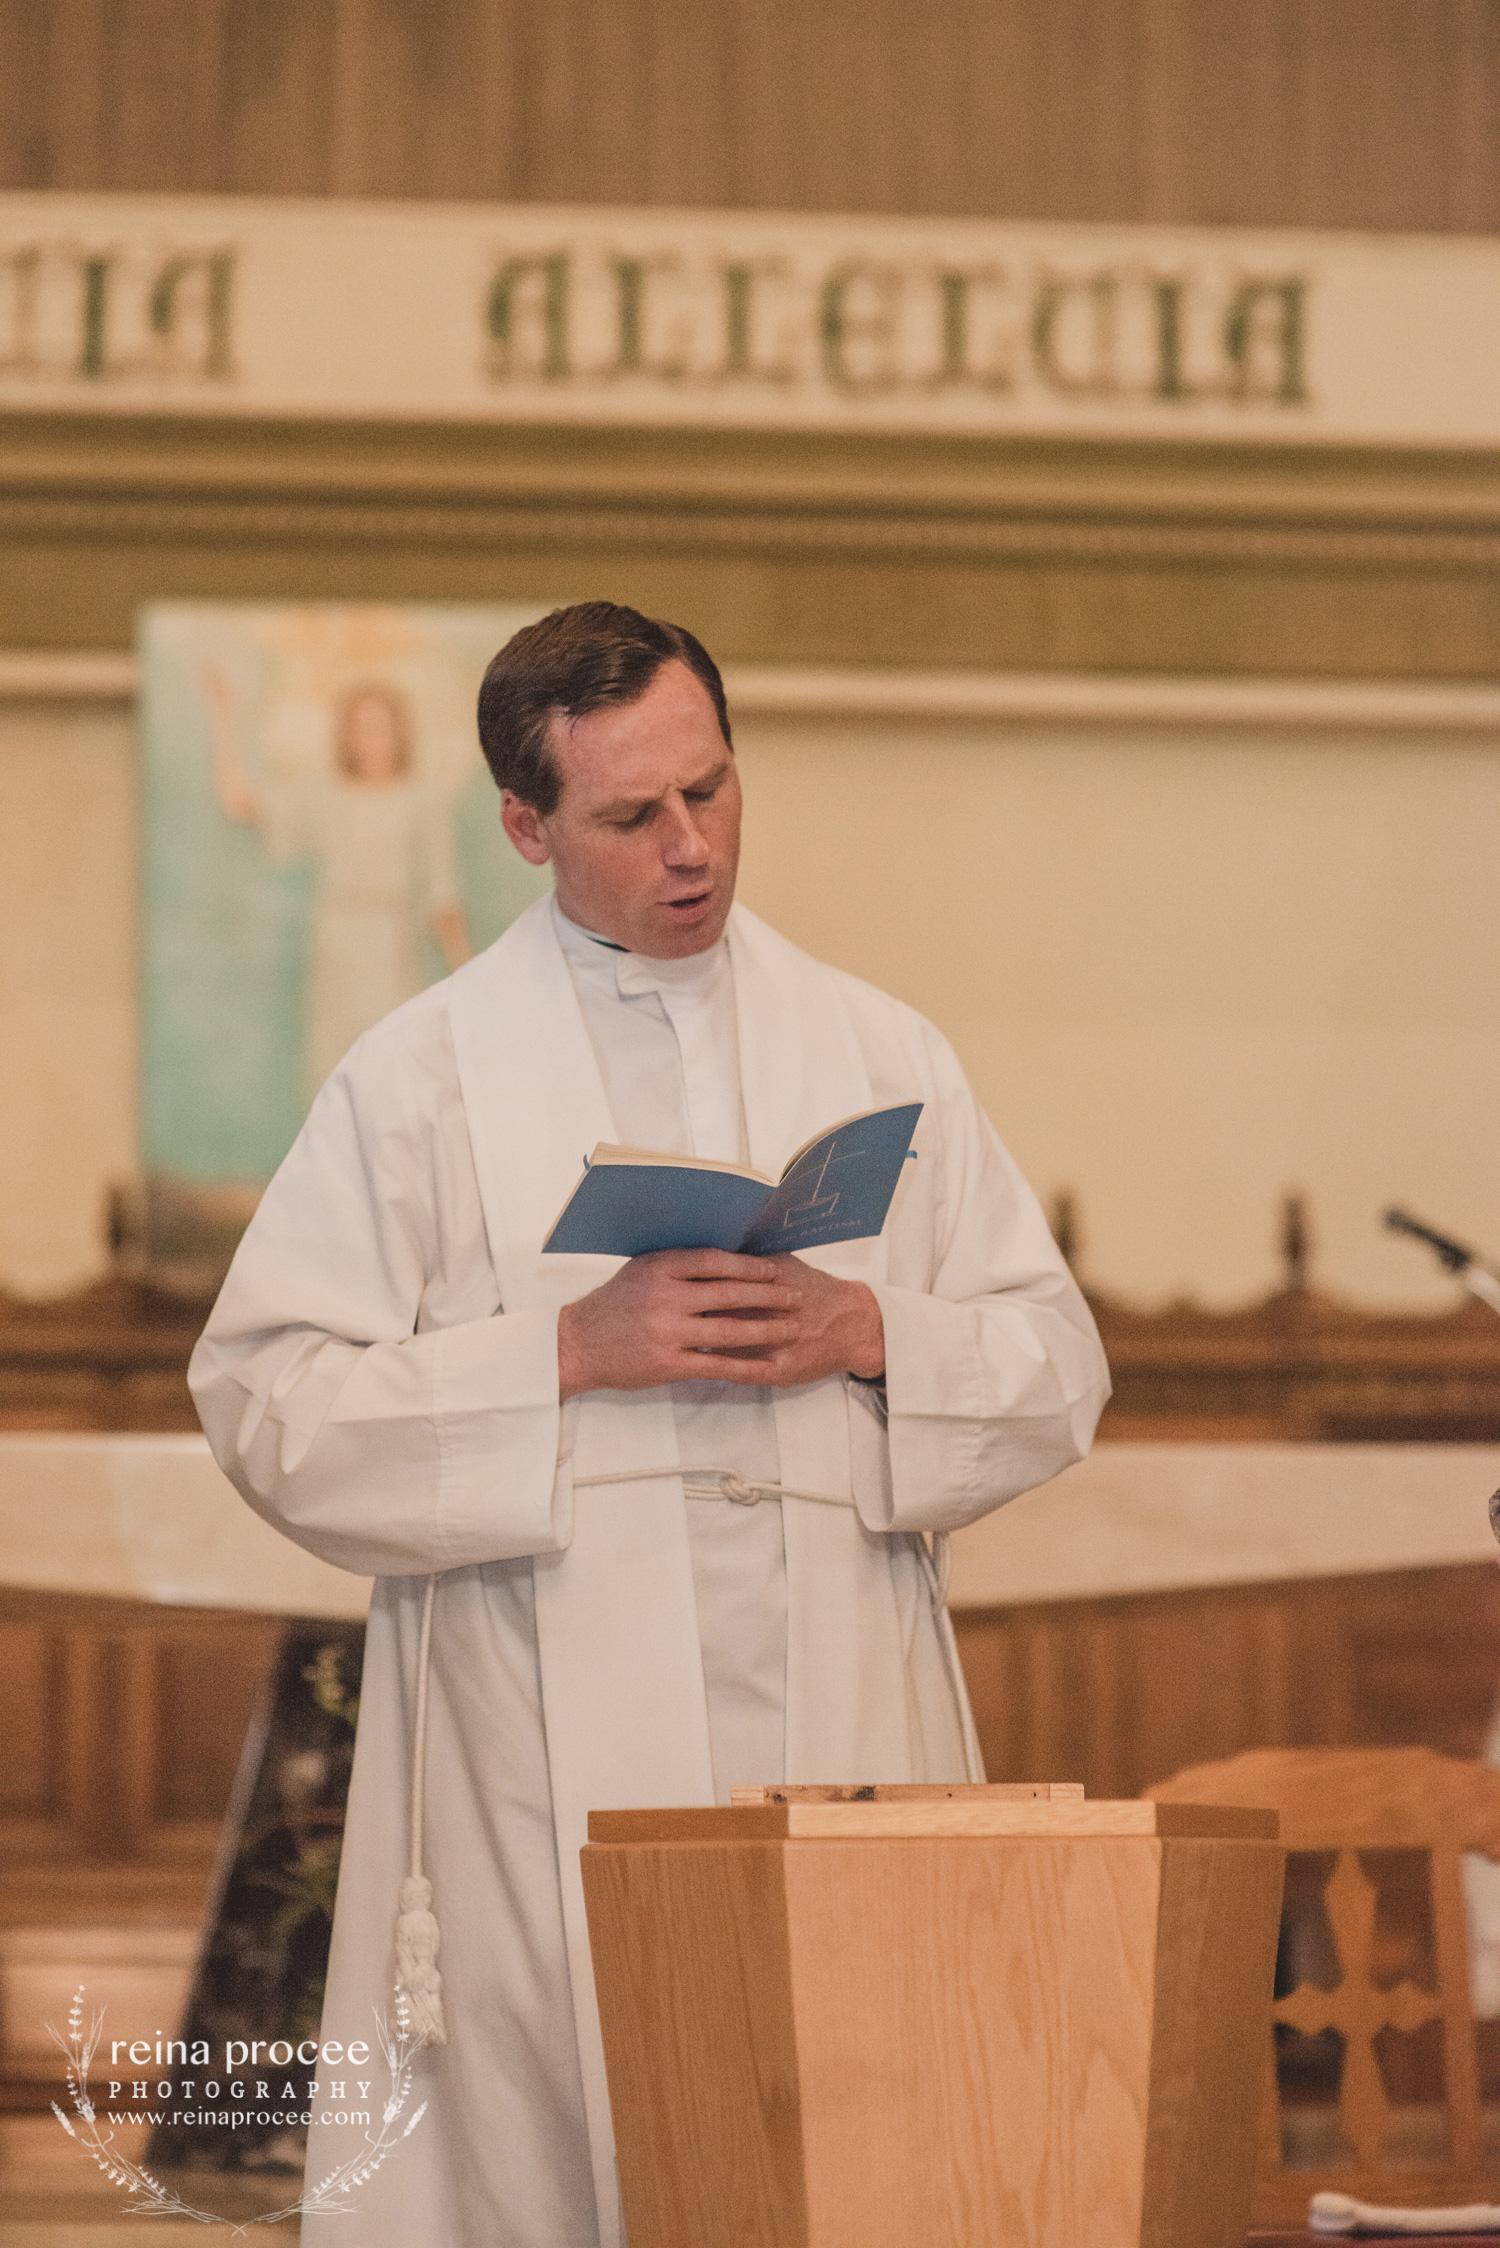 038-baptism-photographer-montreal-family-best-photos-portraits.jpg